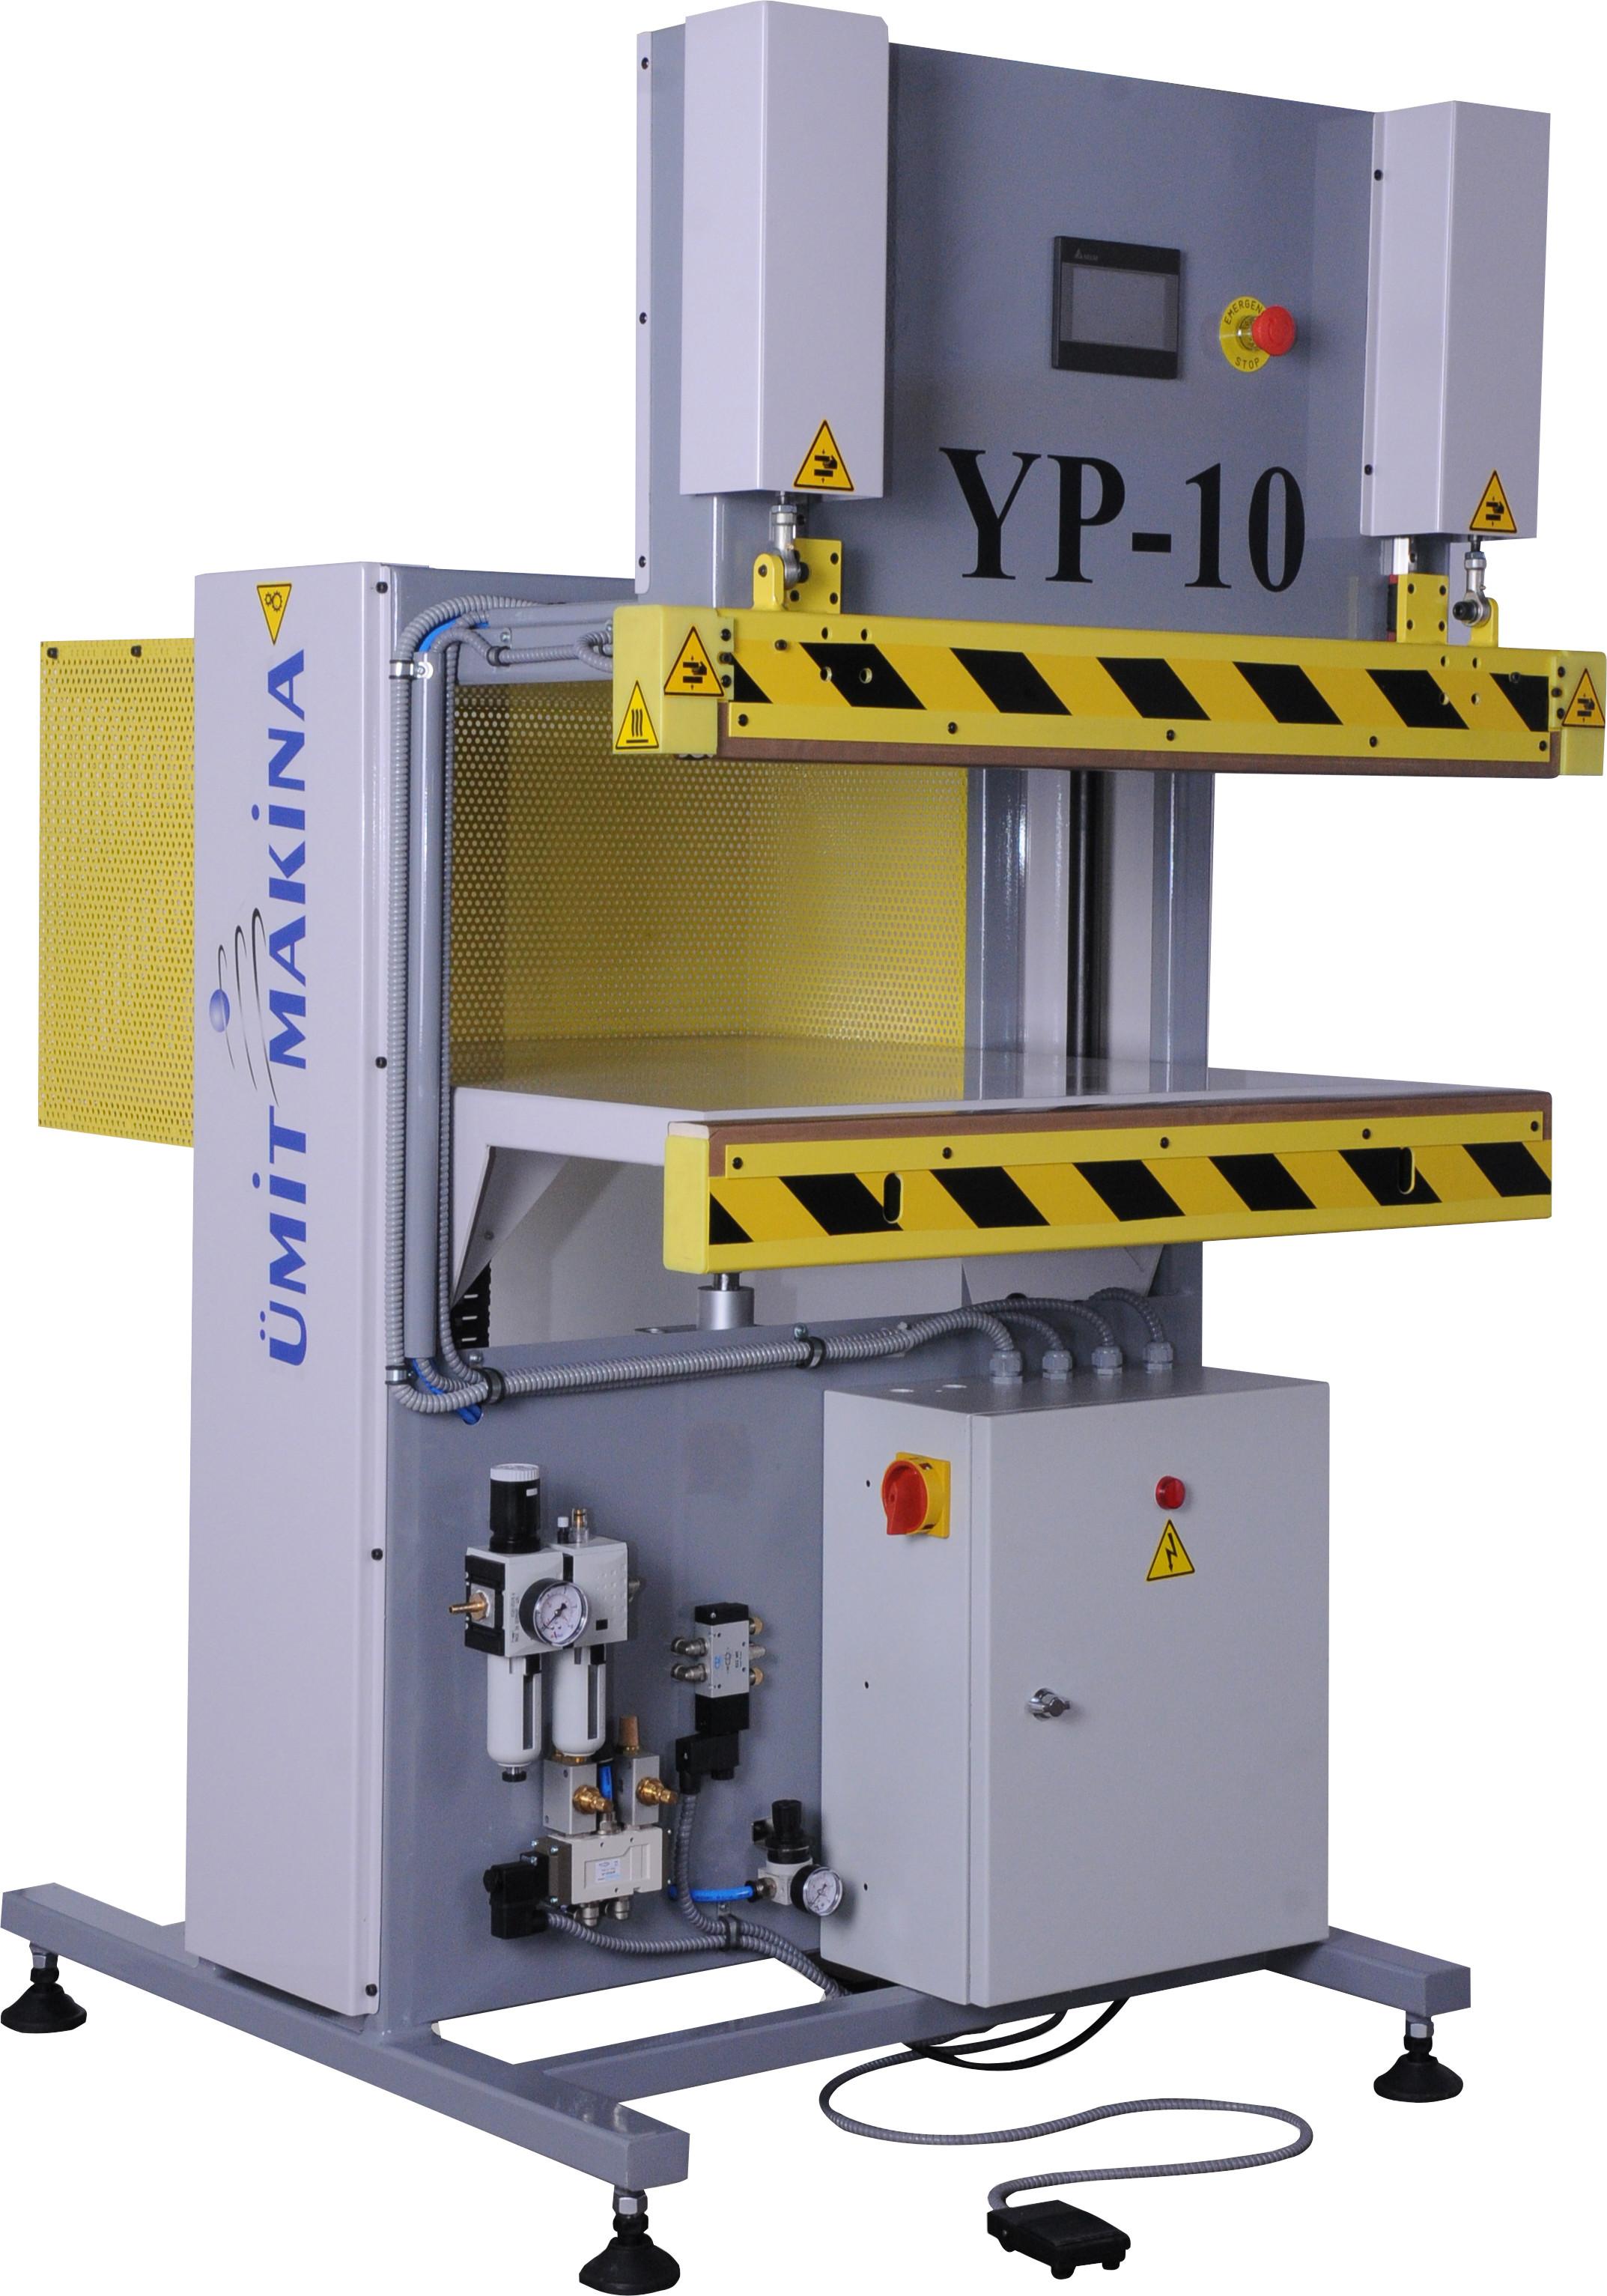 YP-10